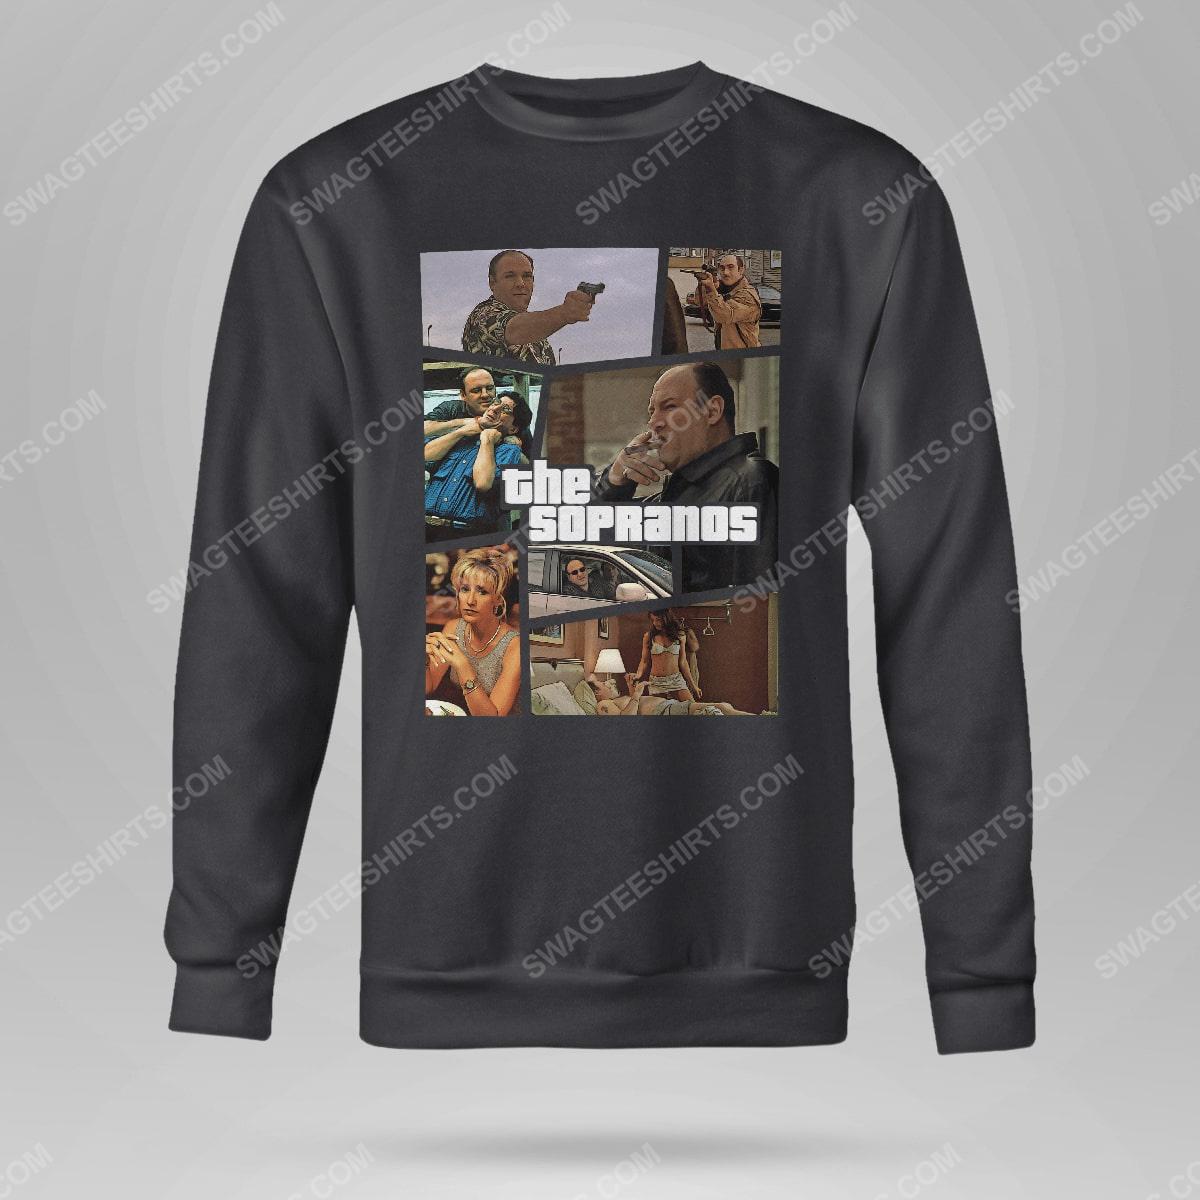 Vintage the sopranos tv show sweatshirt(1)